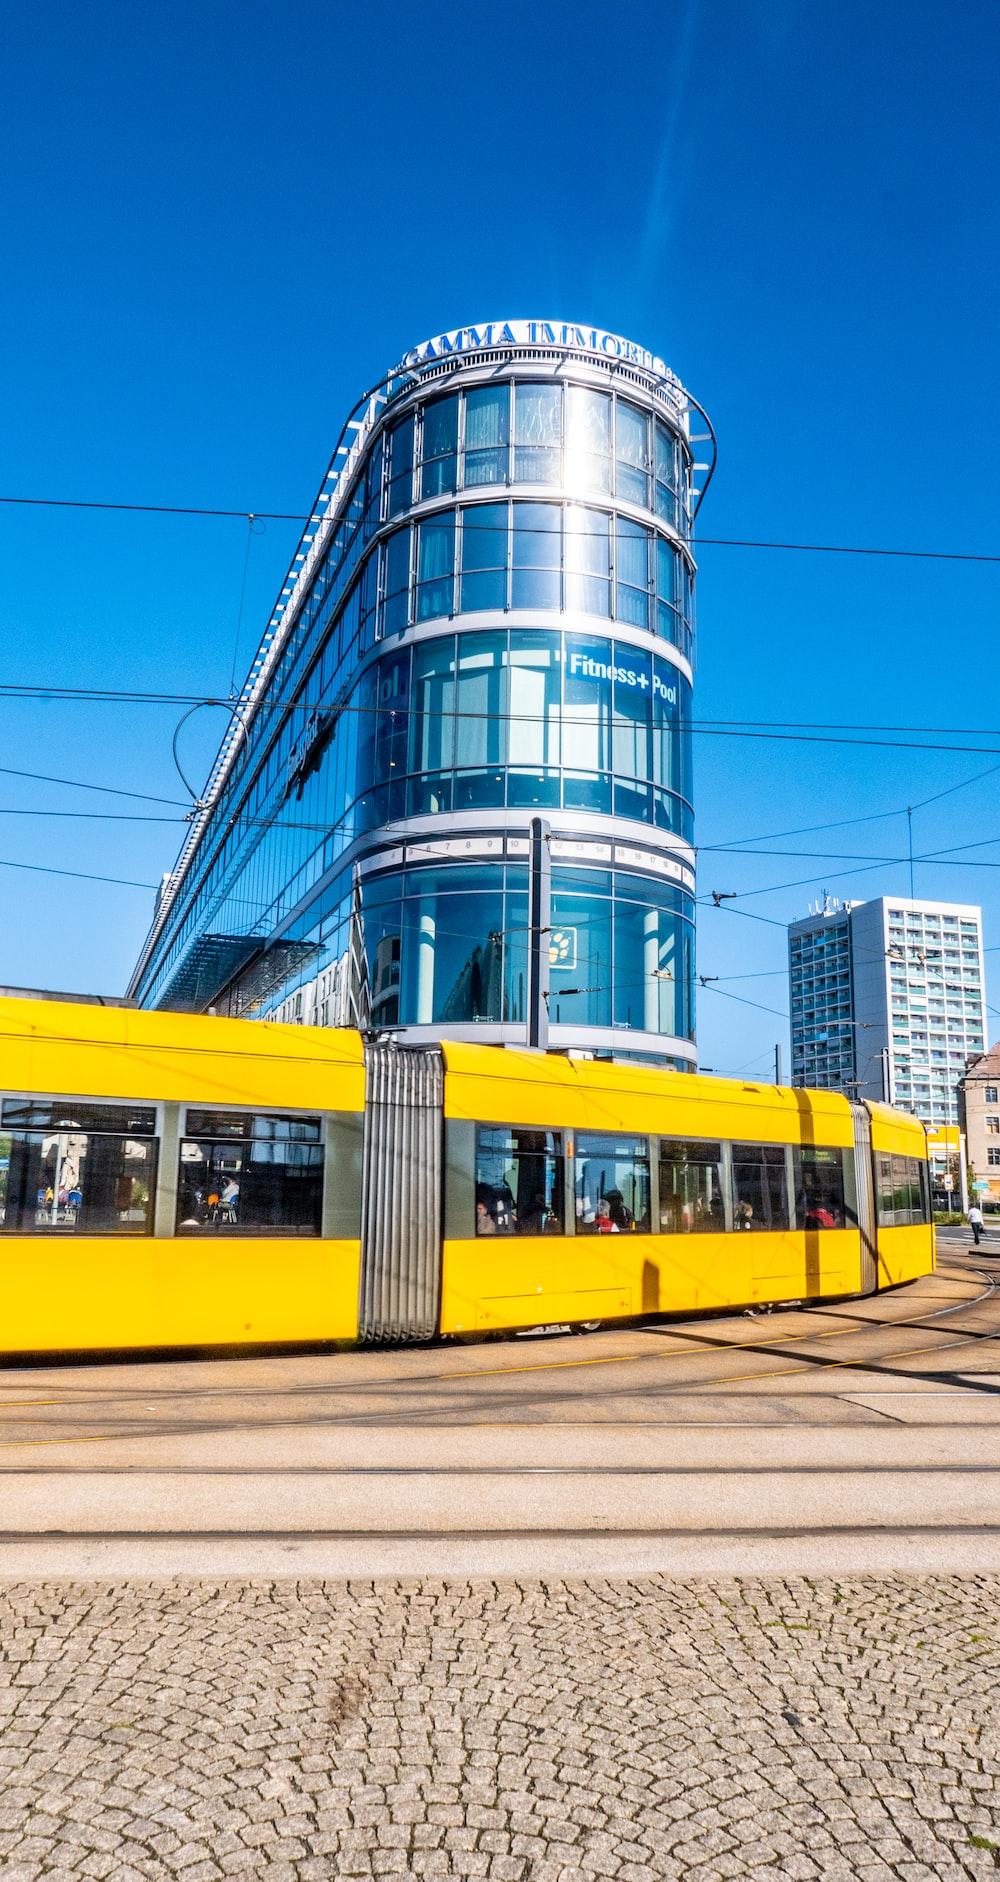 yellow and black train at daytime